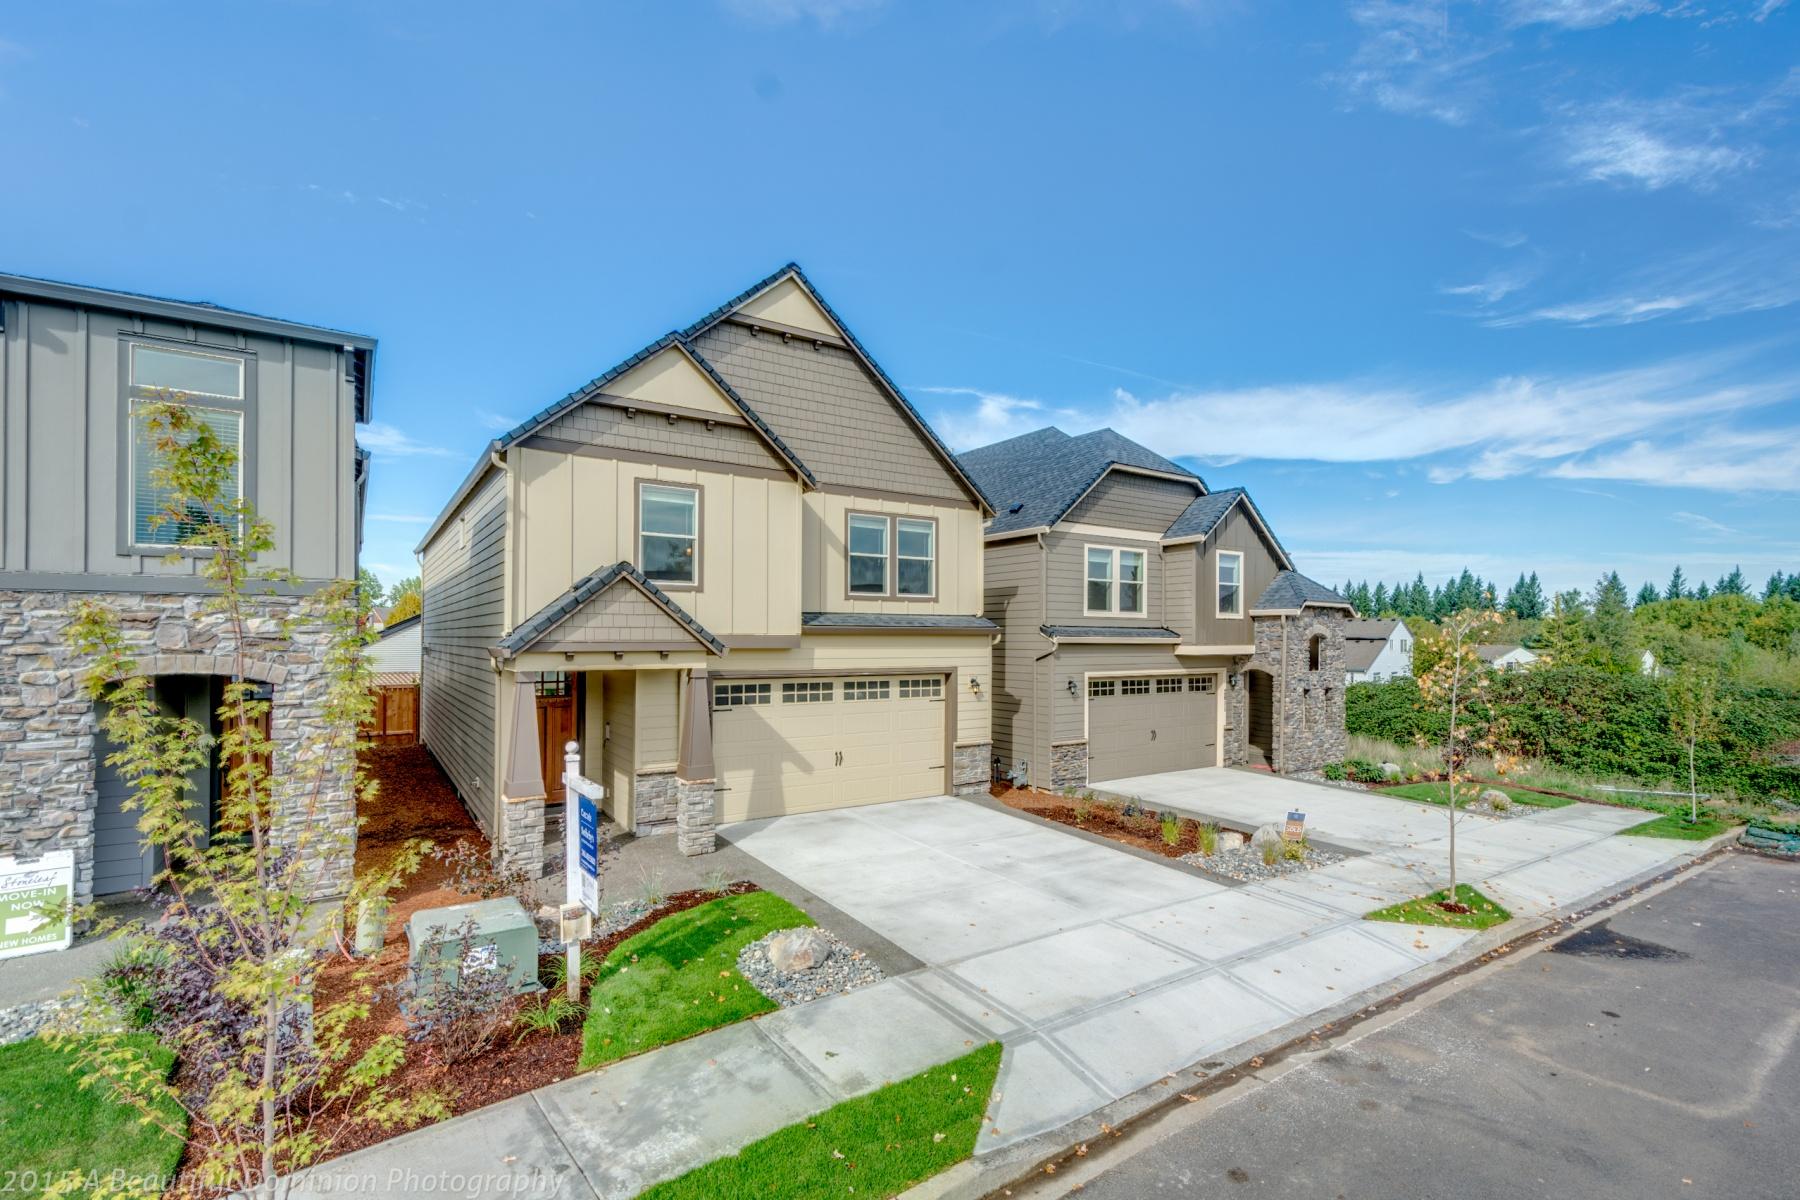 Single Family Home for Sale at 2605 NW Lorenz St Camas, Washington 98607 United States